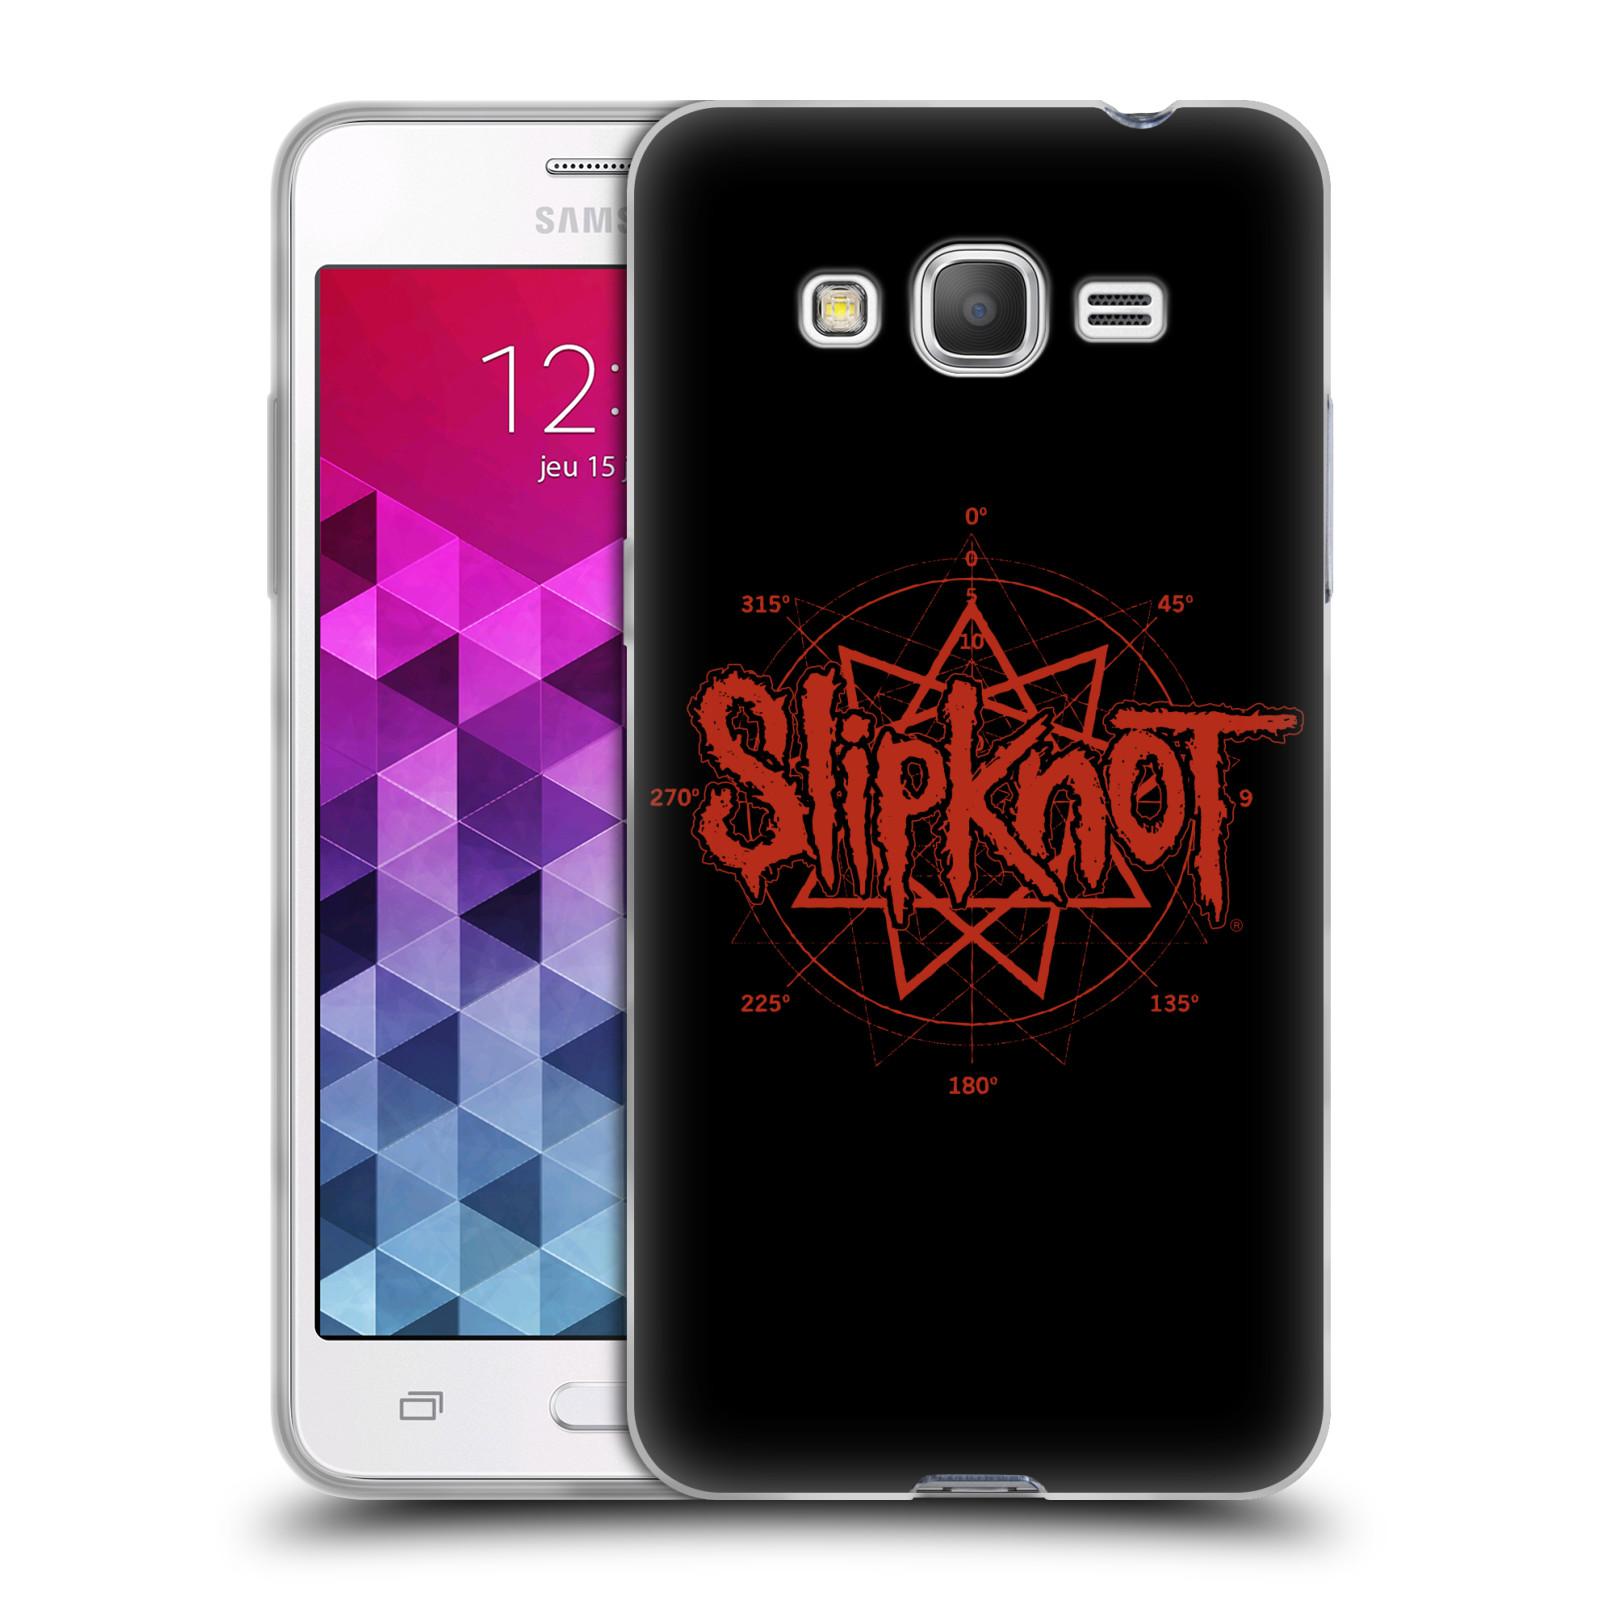 HEAD CASE silikonový obal na mobil Samsung Galaxy Grand Prime hudební skupina Slipknot logo